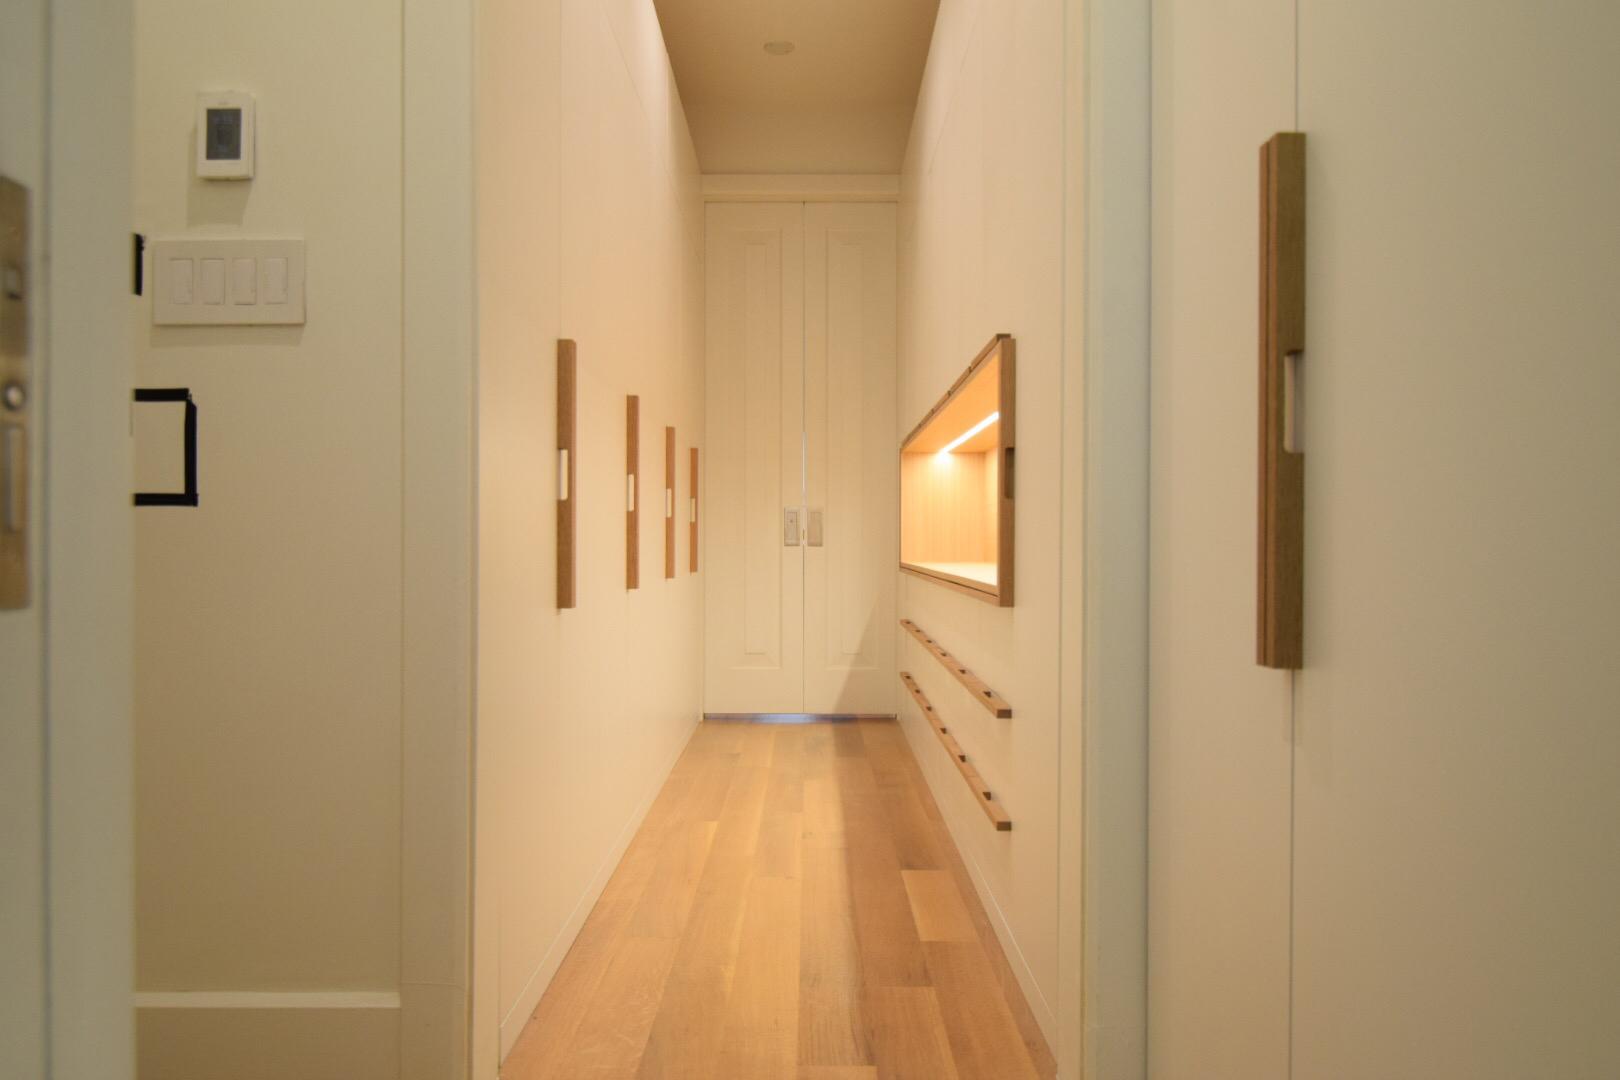 custom-walk-in-closet-white-lacquer-finish-maple-interior-white-oak-handles-white-oak-accent-open-display-cabinet.jpg